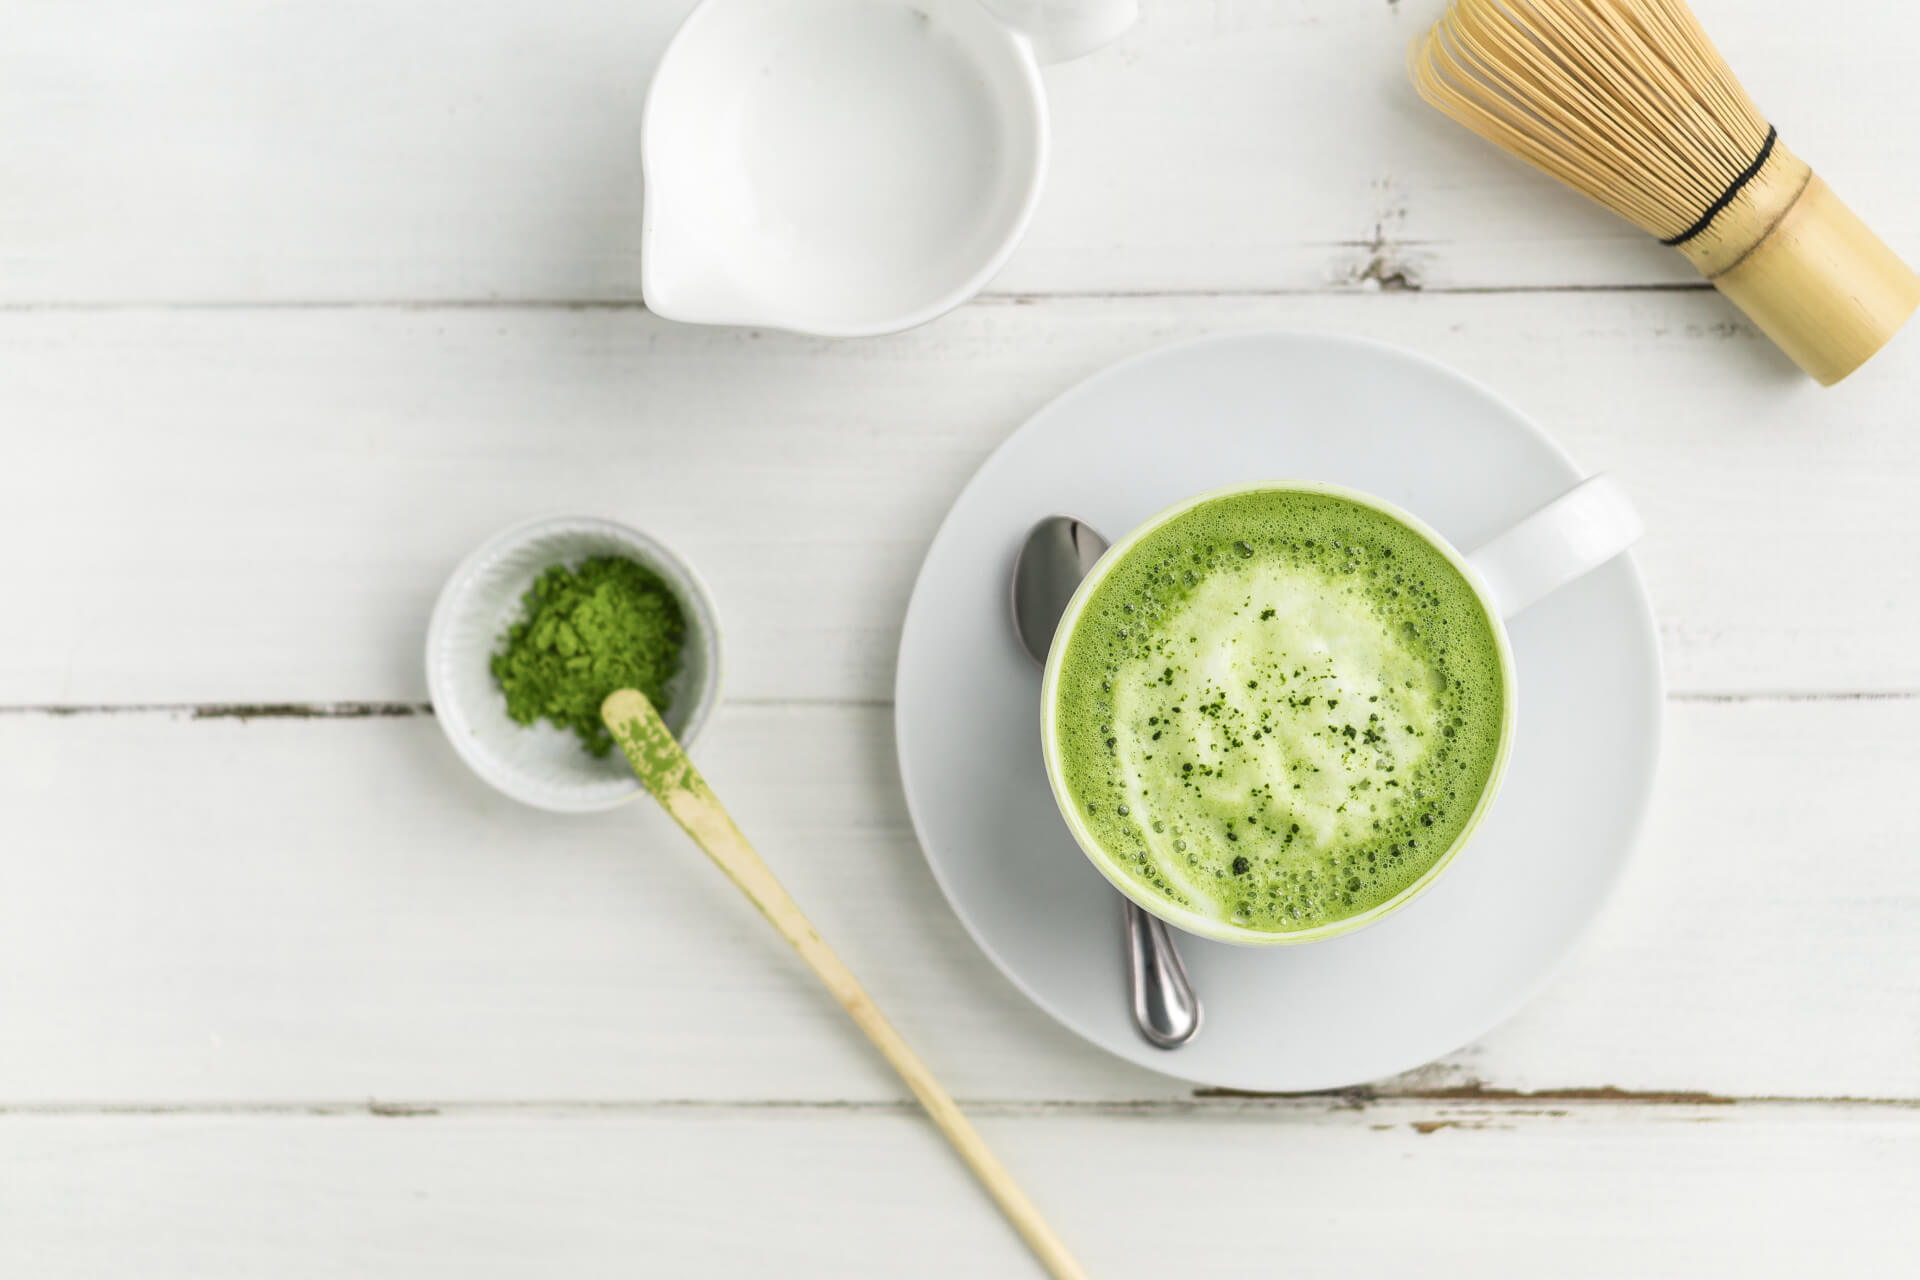 Homemade Matcha Latte Image